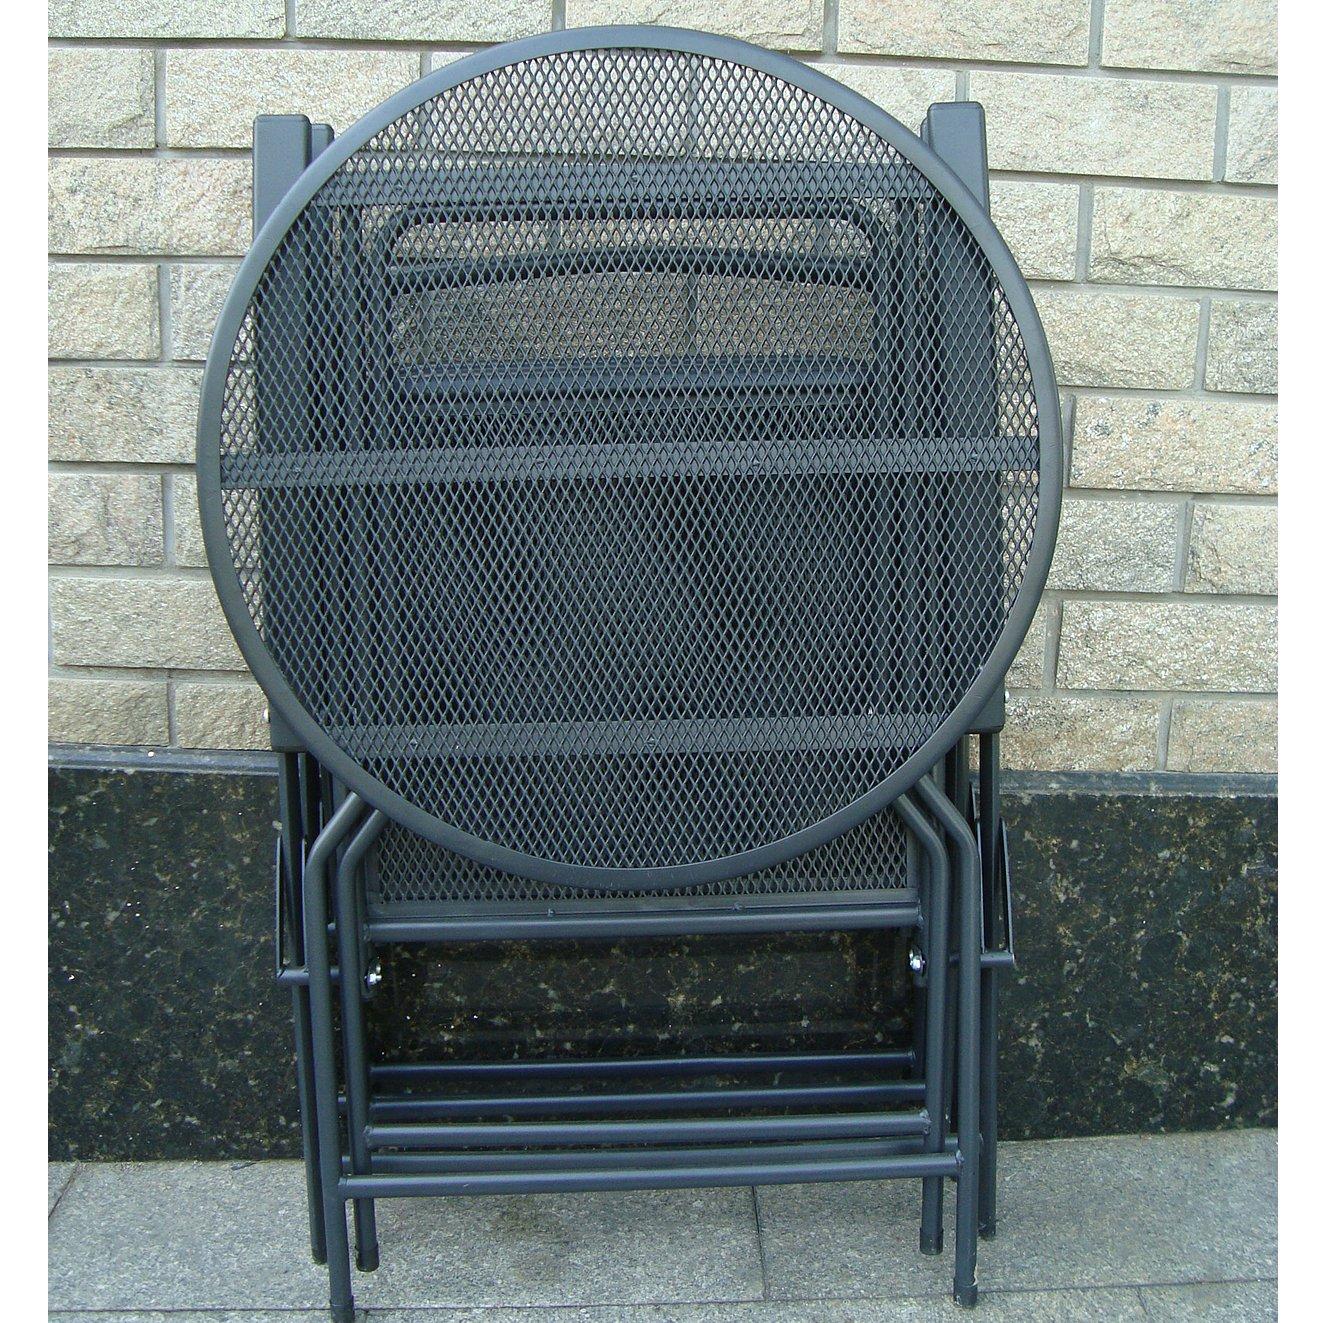 Amazon.com : BenefitUSA S 405 BLK Patio Table And Chair Set, Black : Patio,  Lawn U0026 Garden